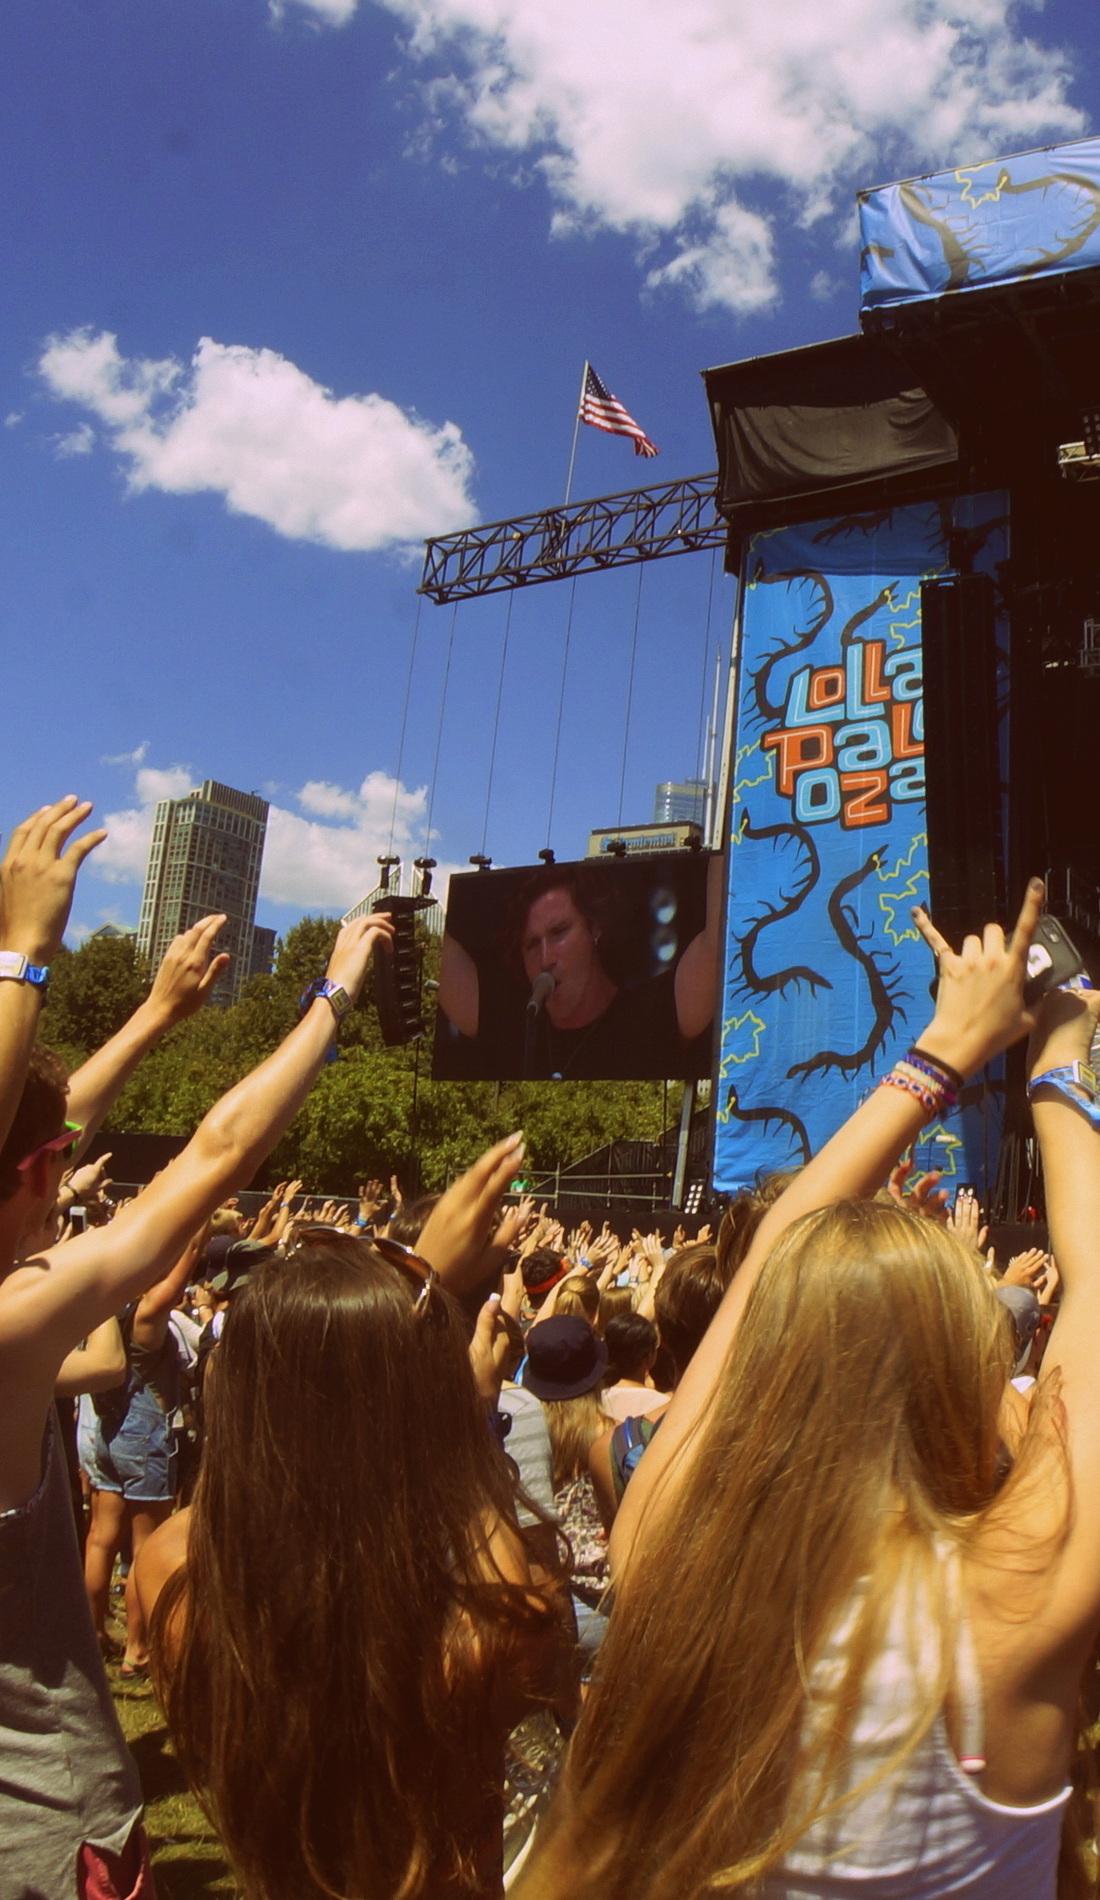 A Lollapalooza live event